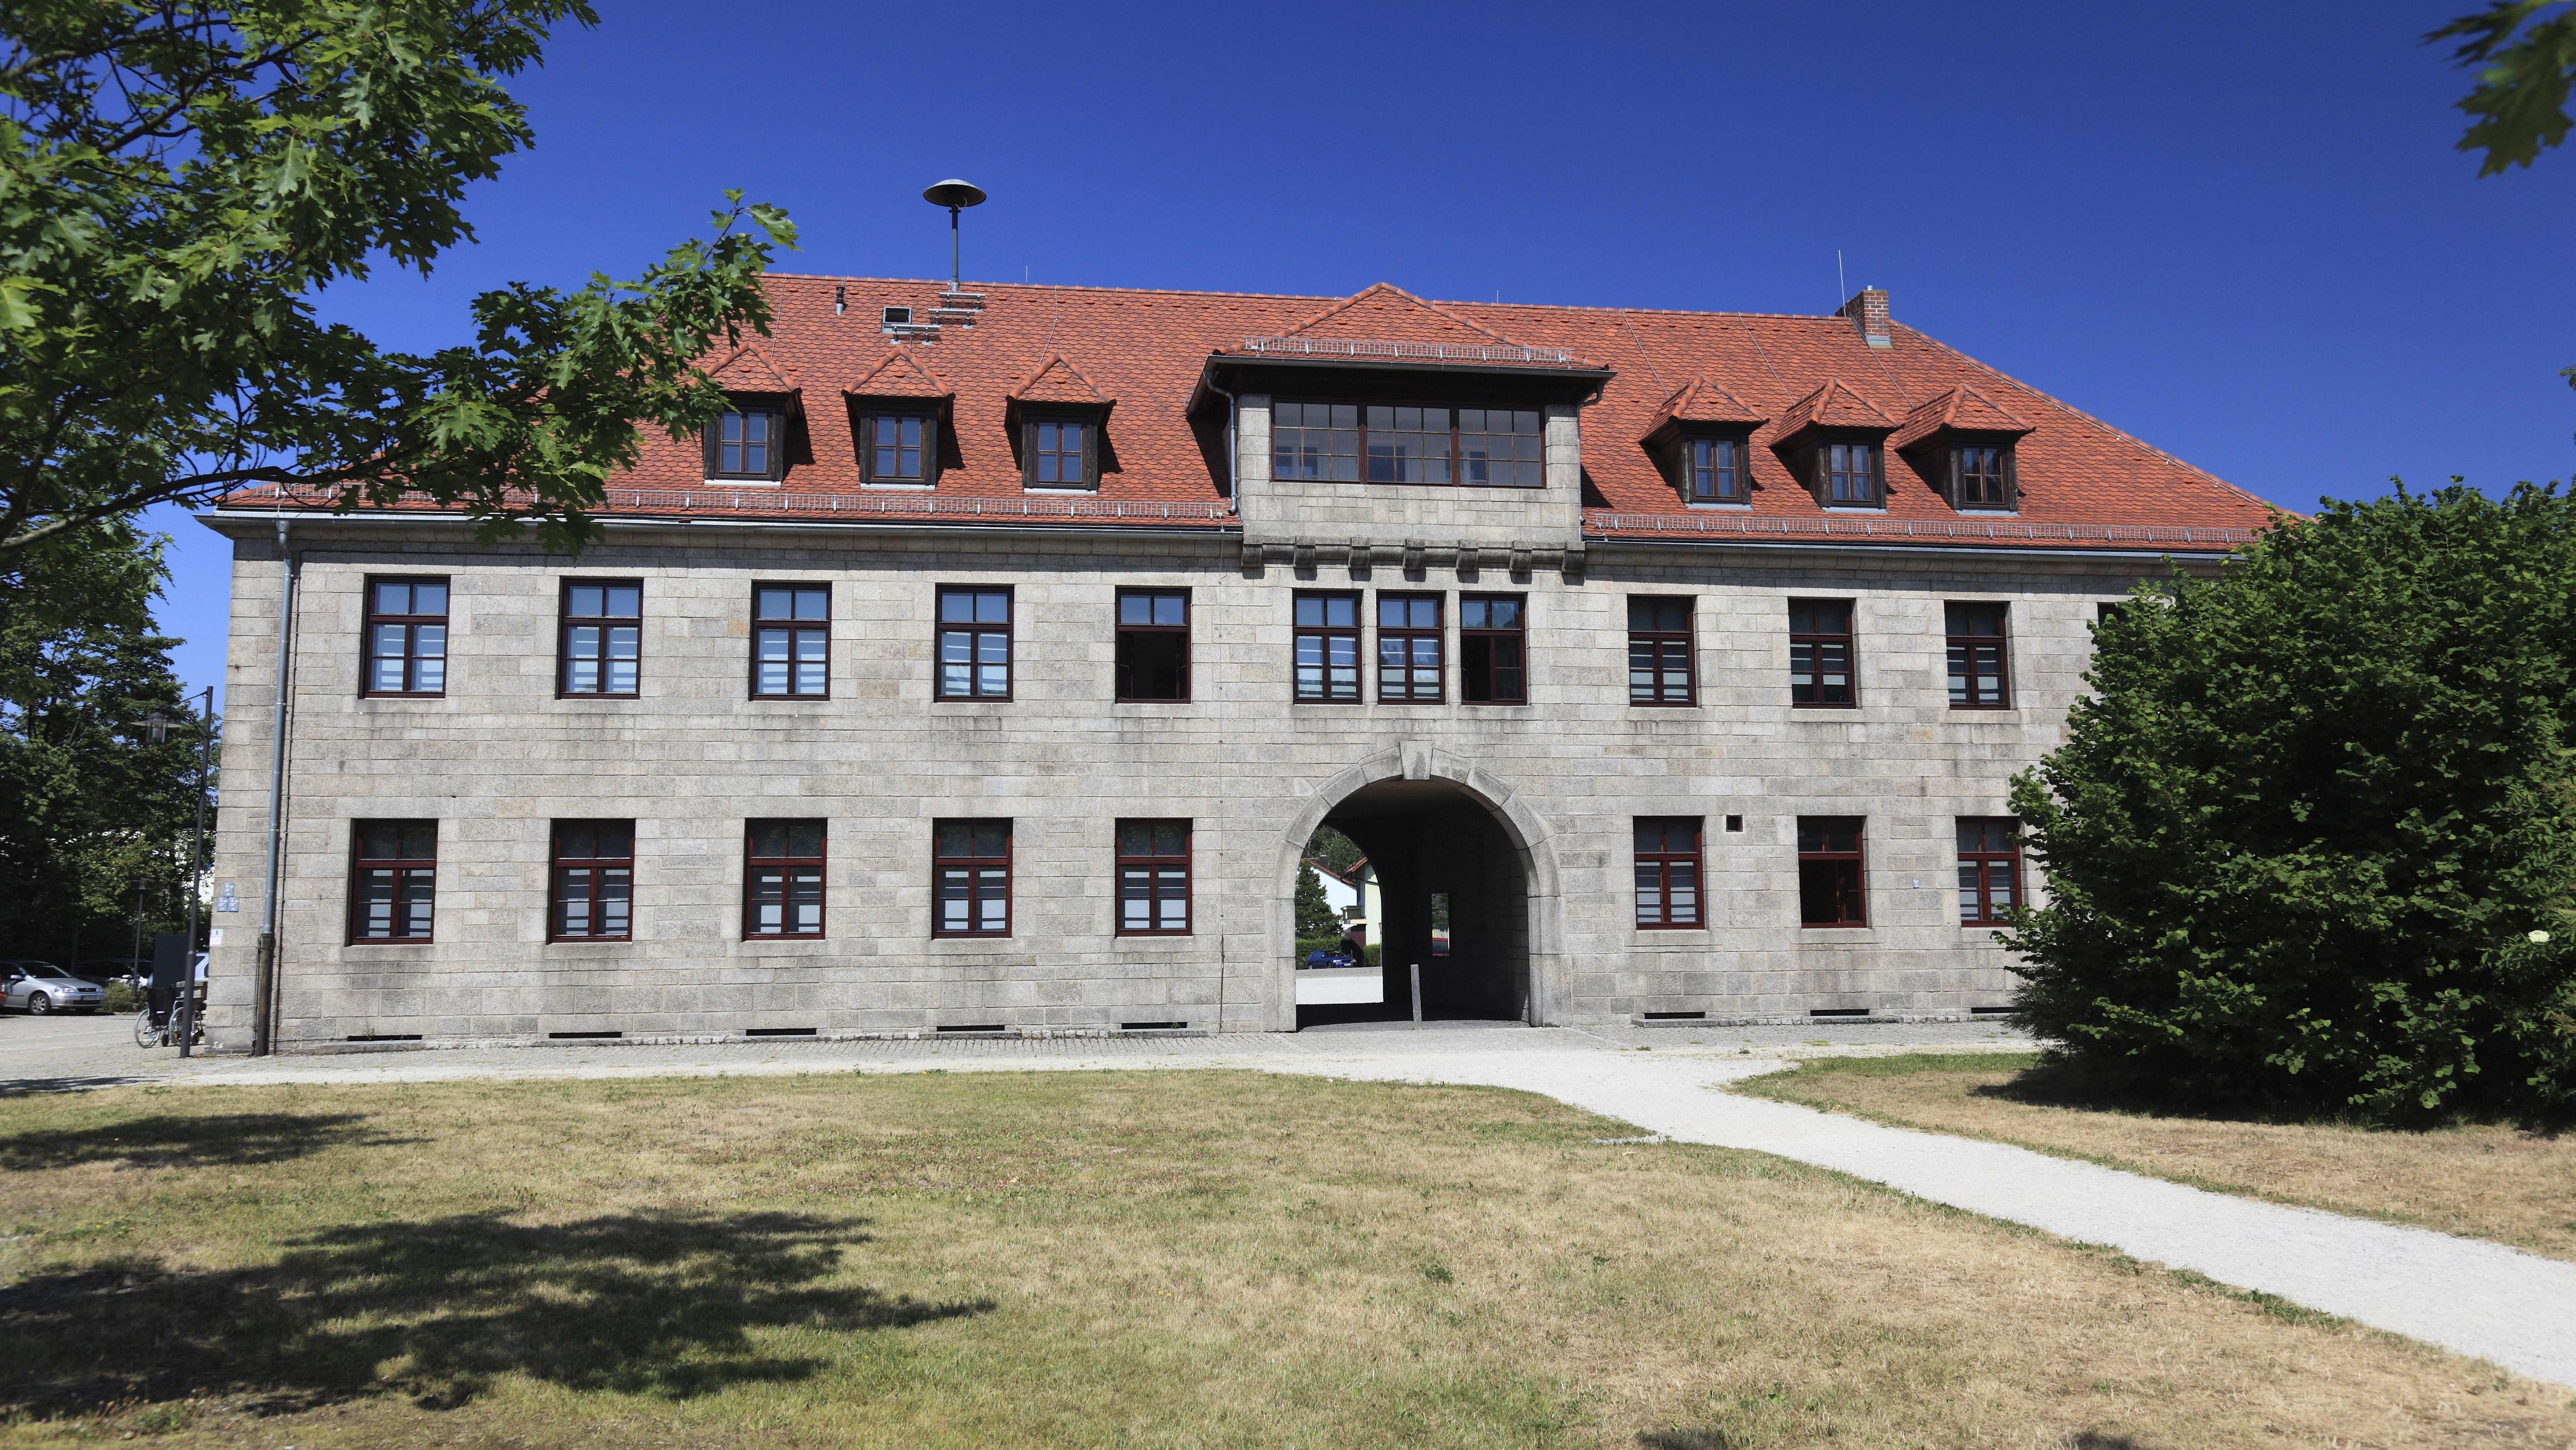 Eingang der KZ-Gedenkstätte Flossenbürg.